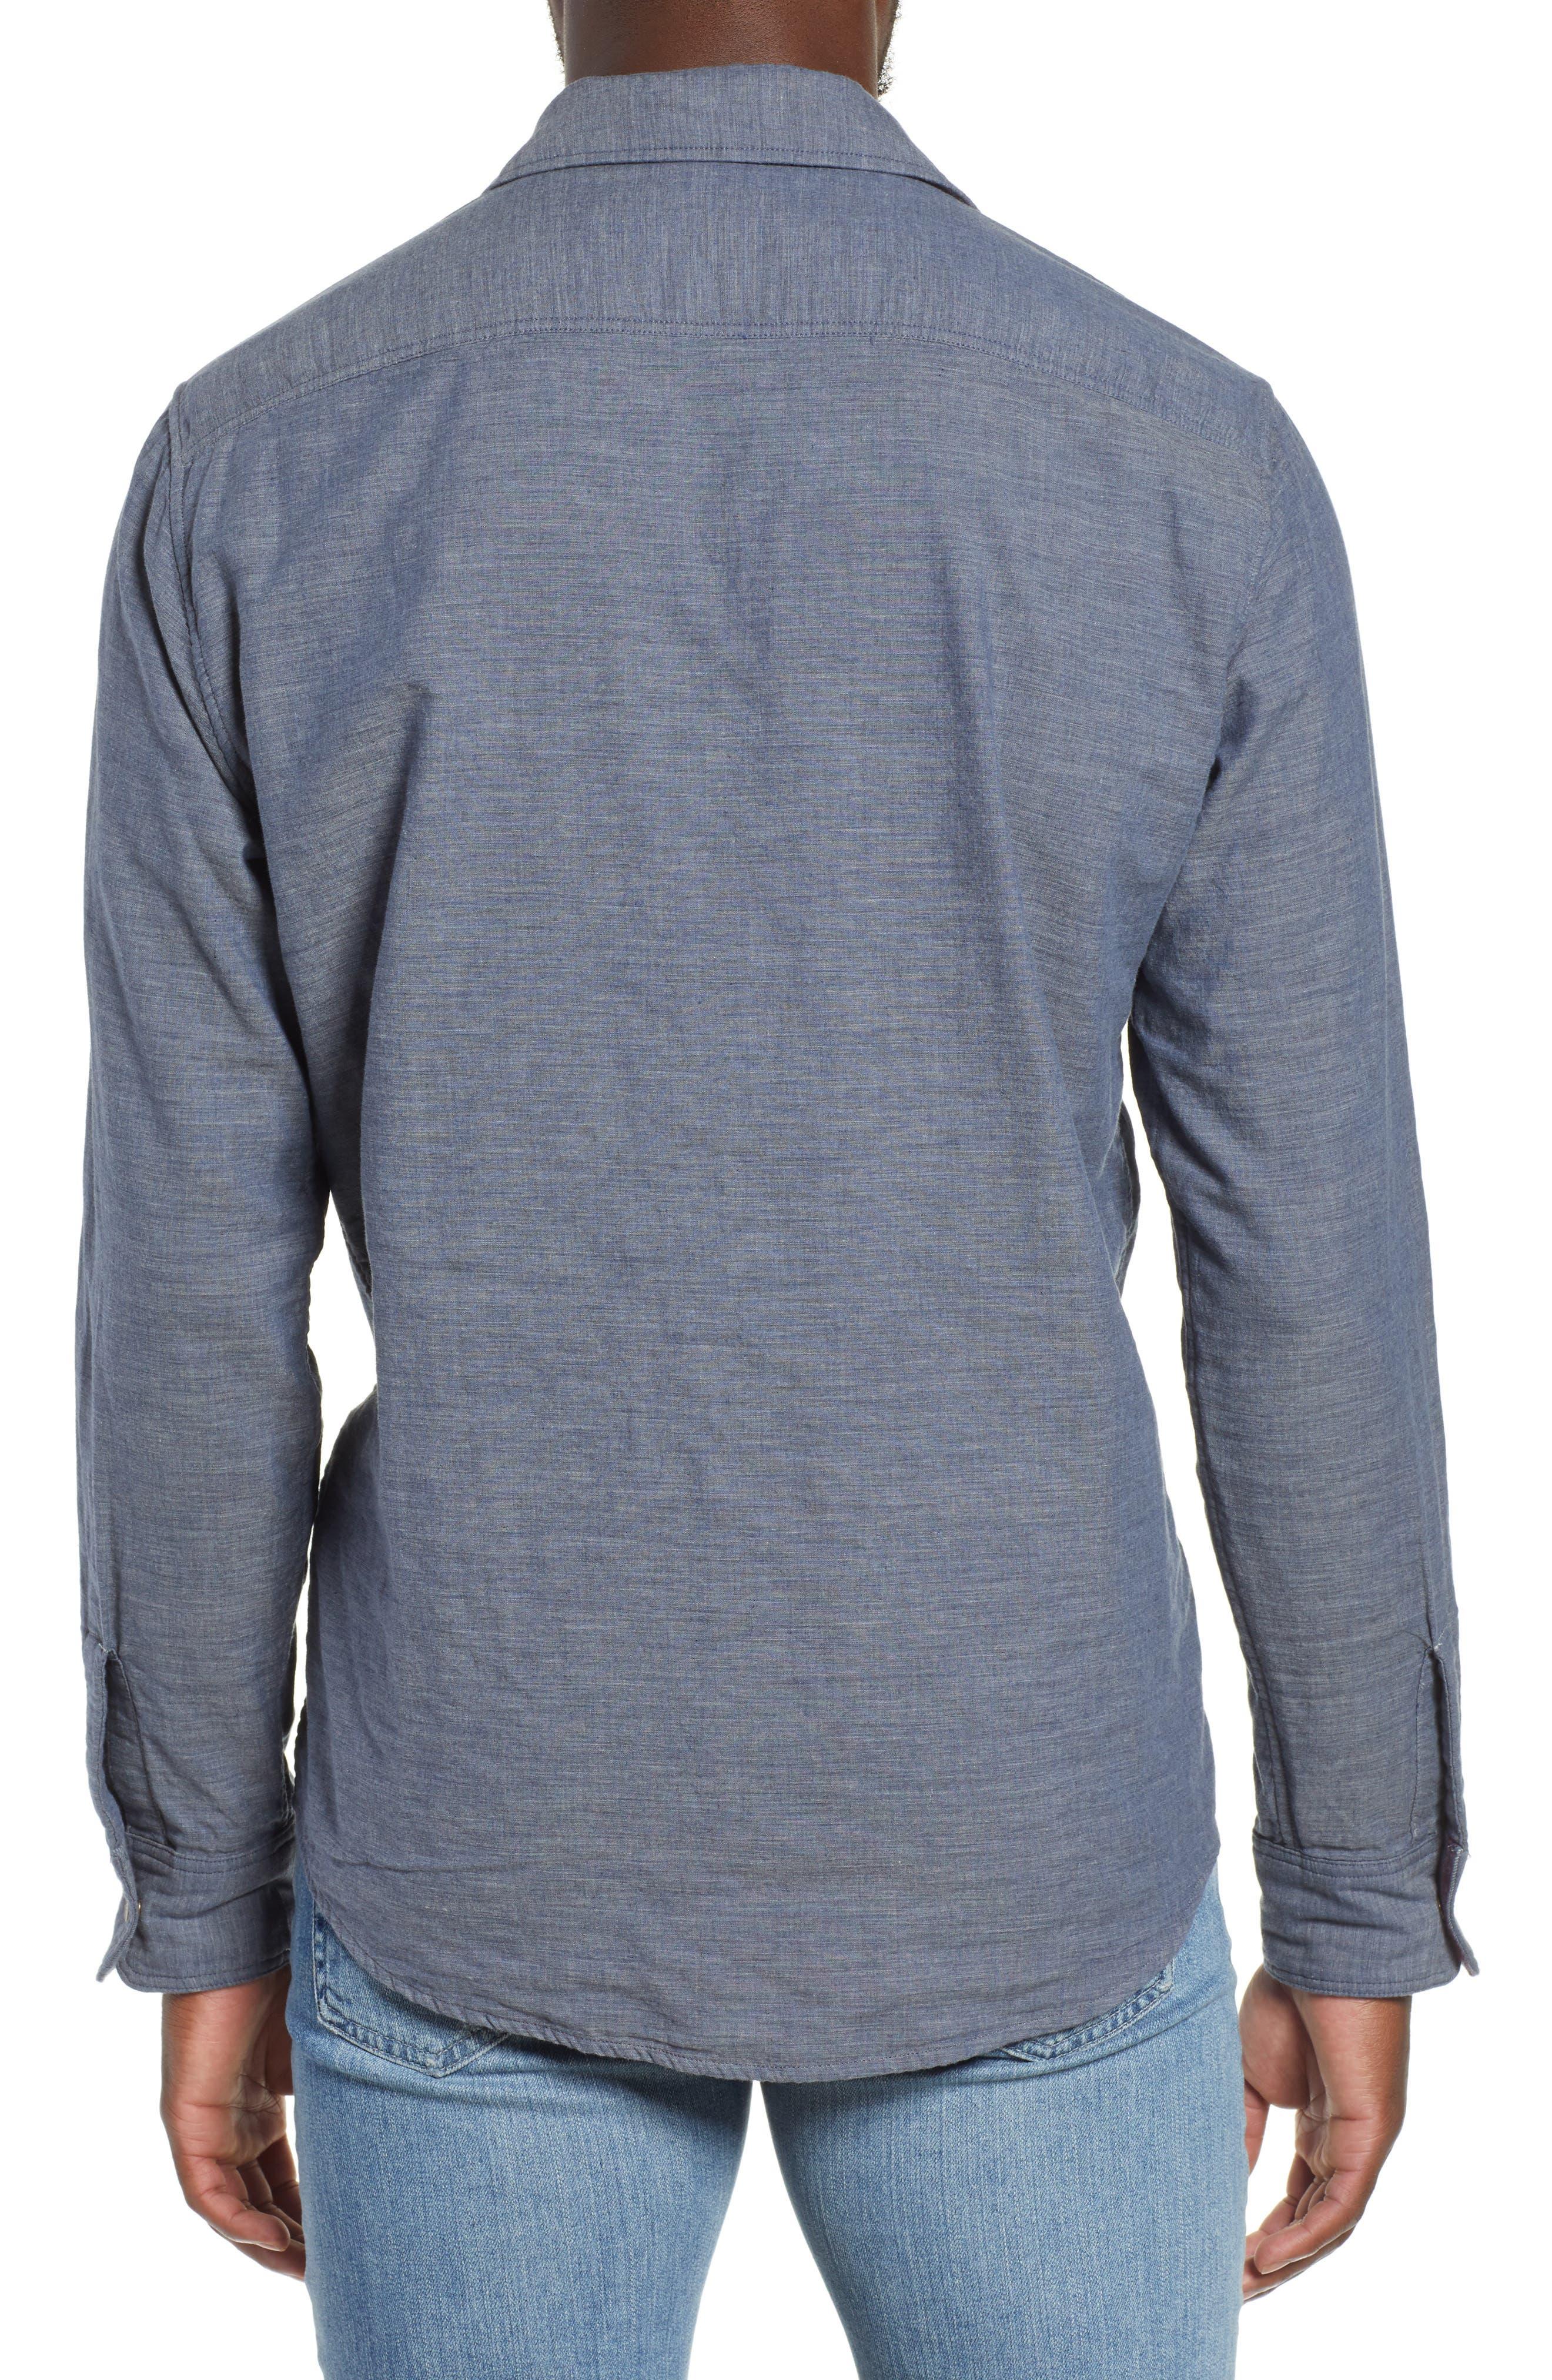 Belmar Reversible Sport Shirt,                             Alternate thumbnail 4, color,                             SLATE HEATHER / SERAPE